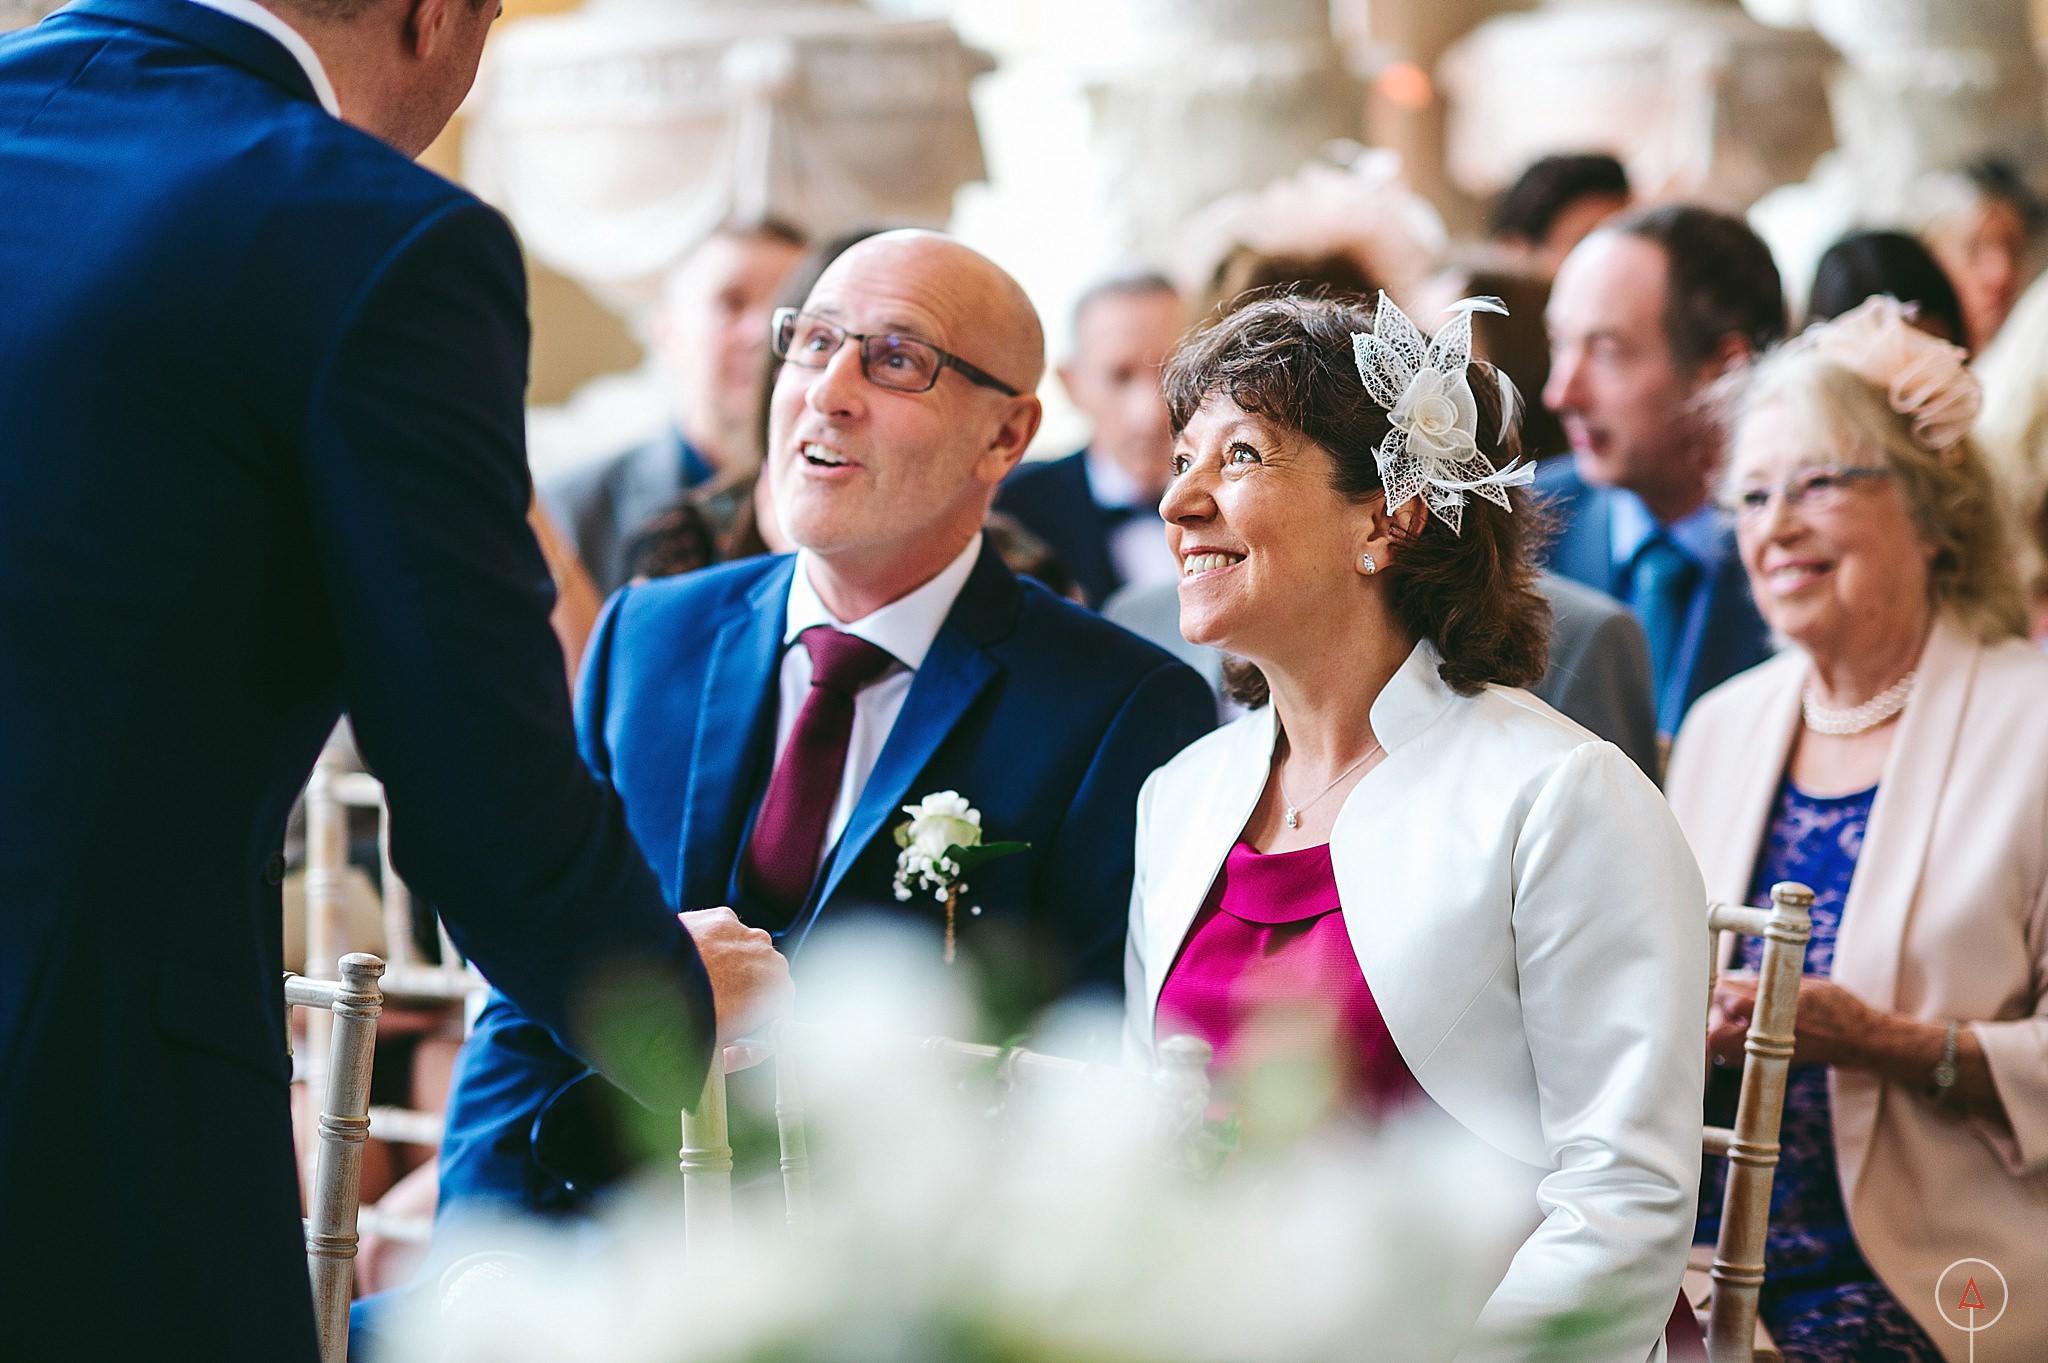 cardiff-wedding-photographer-aga-tomaszek_0243